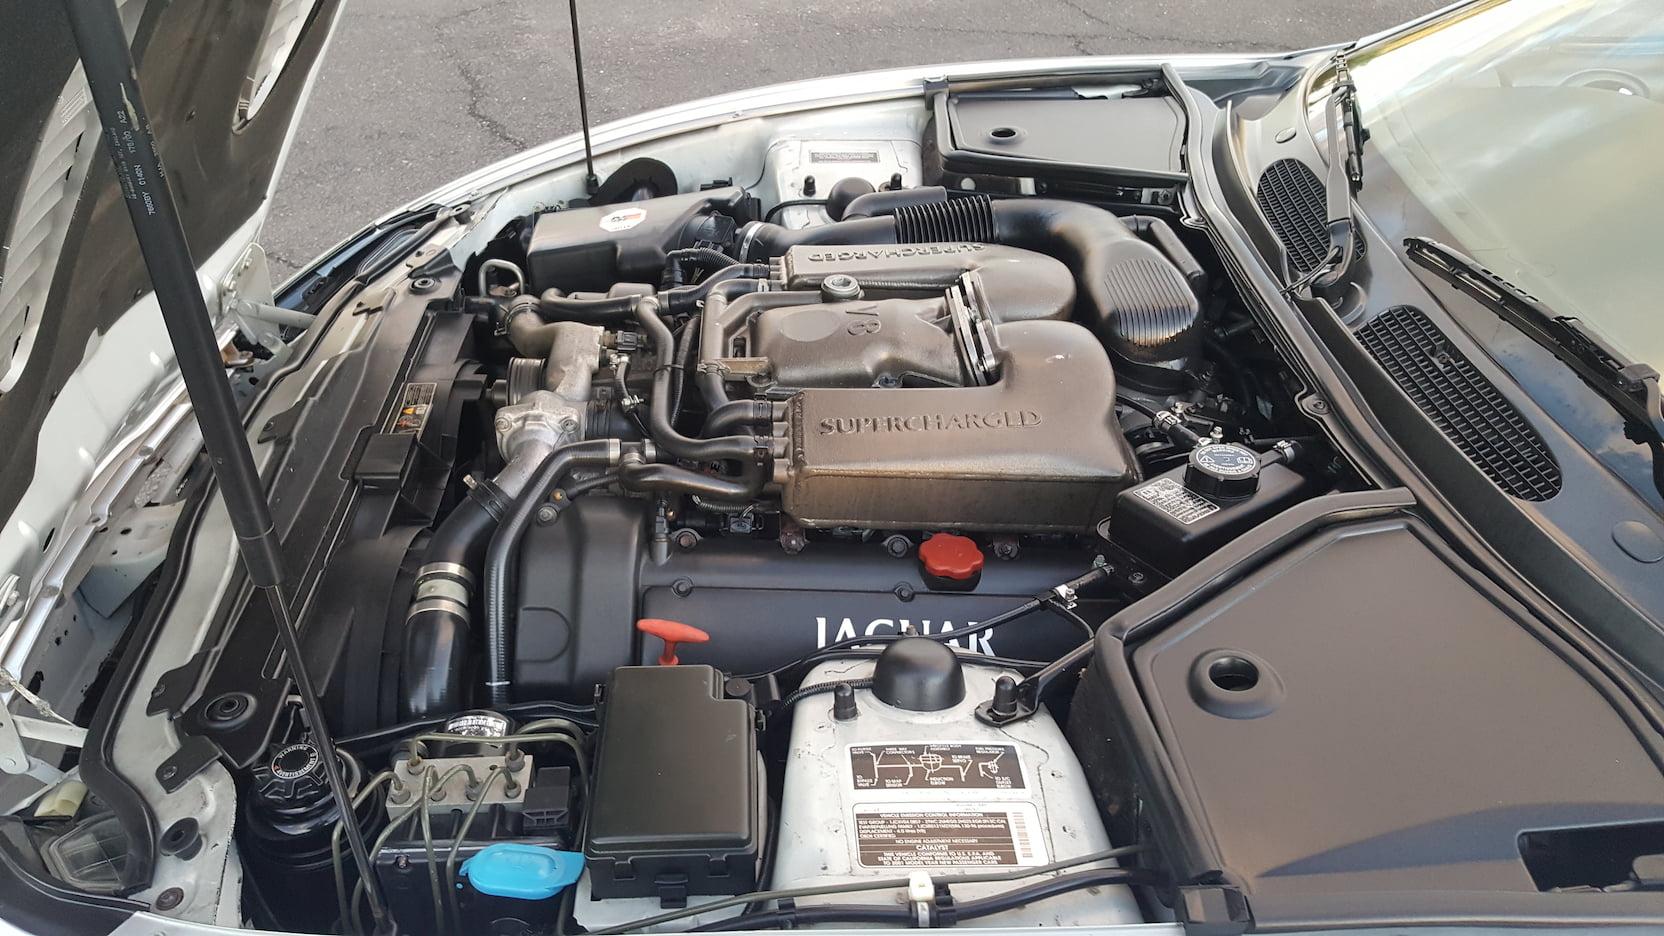 2001 Jaguar XKR engine